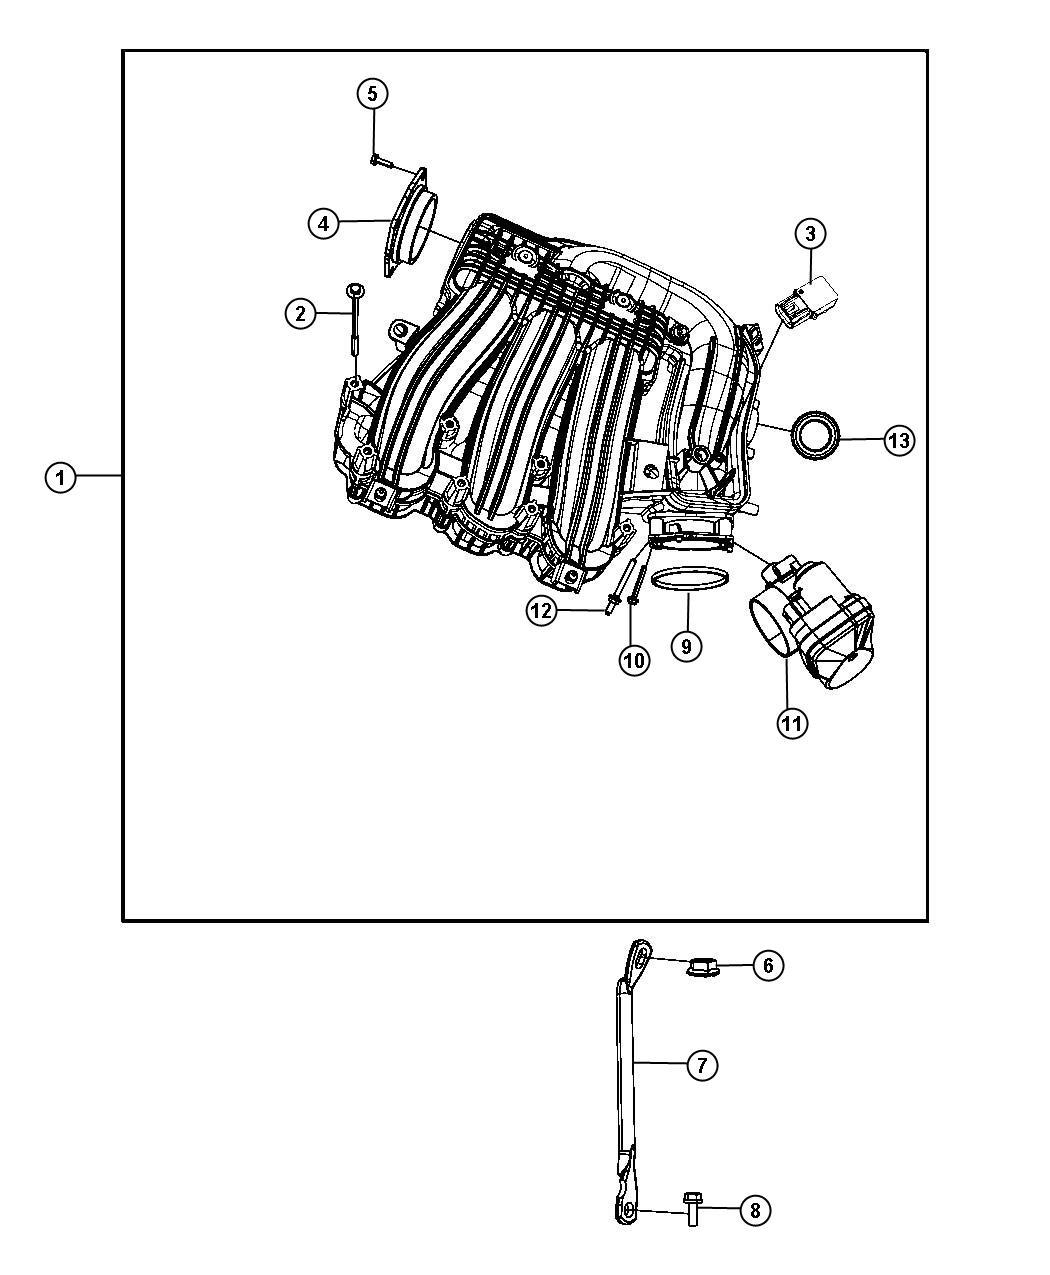 bentley flying spur wiring diagram 1996 honda civic alternator service manual [2008 ford edge intake manifold removal] - 2008 ...